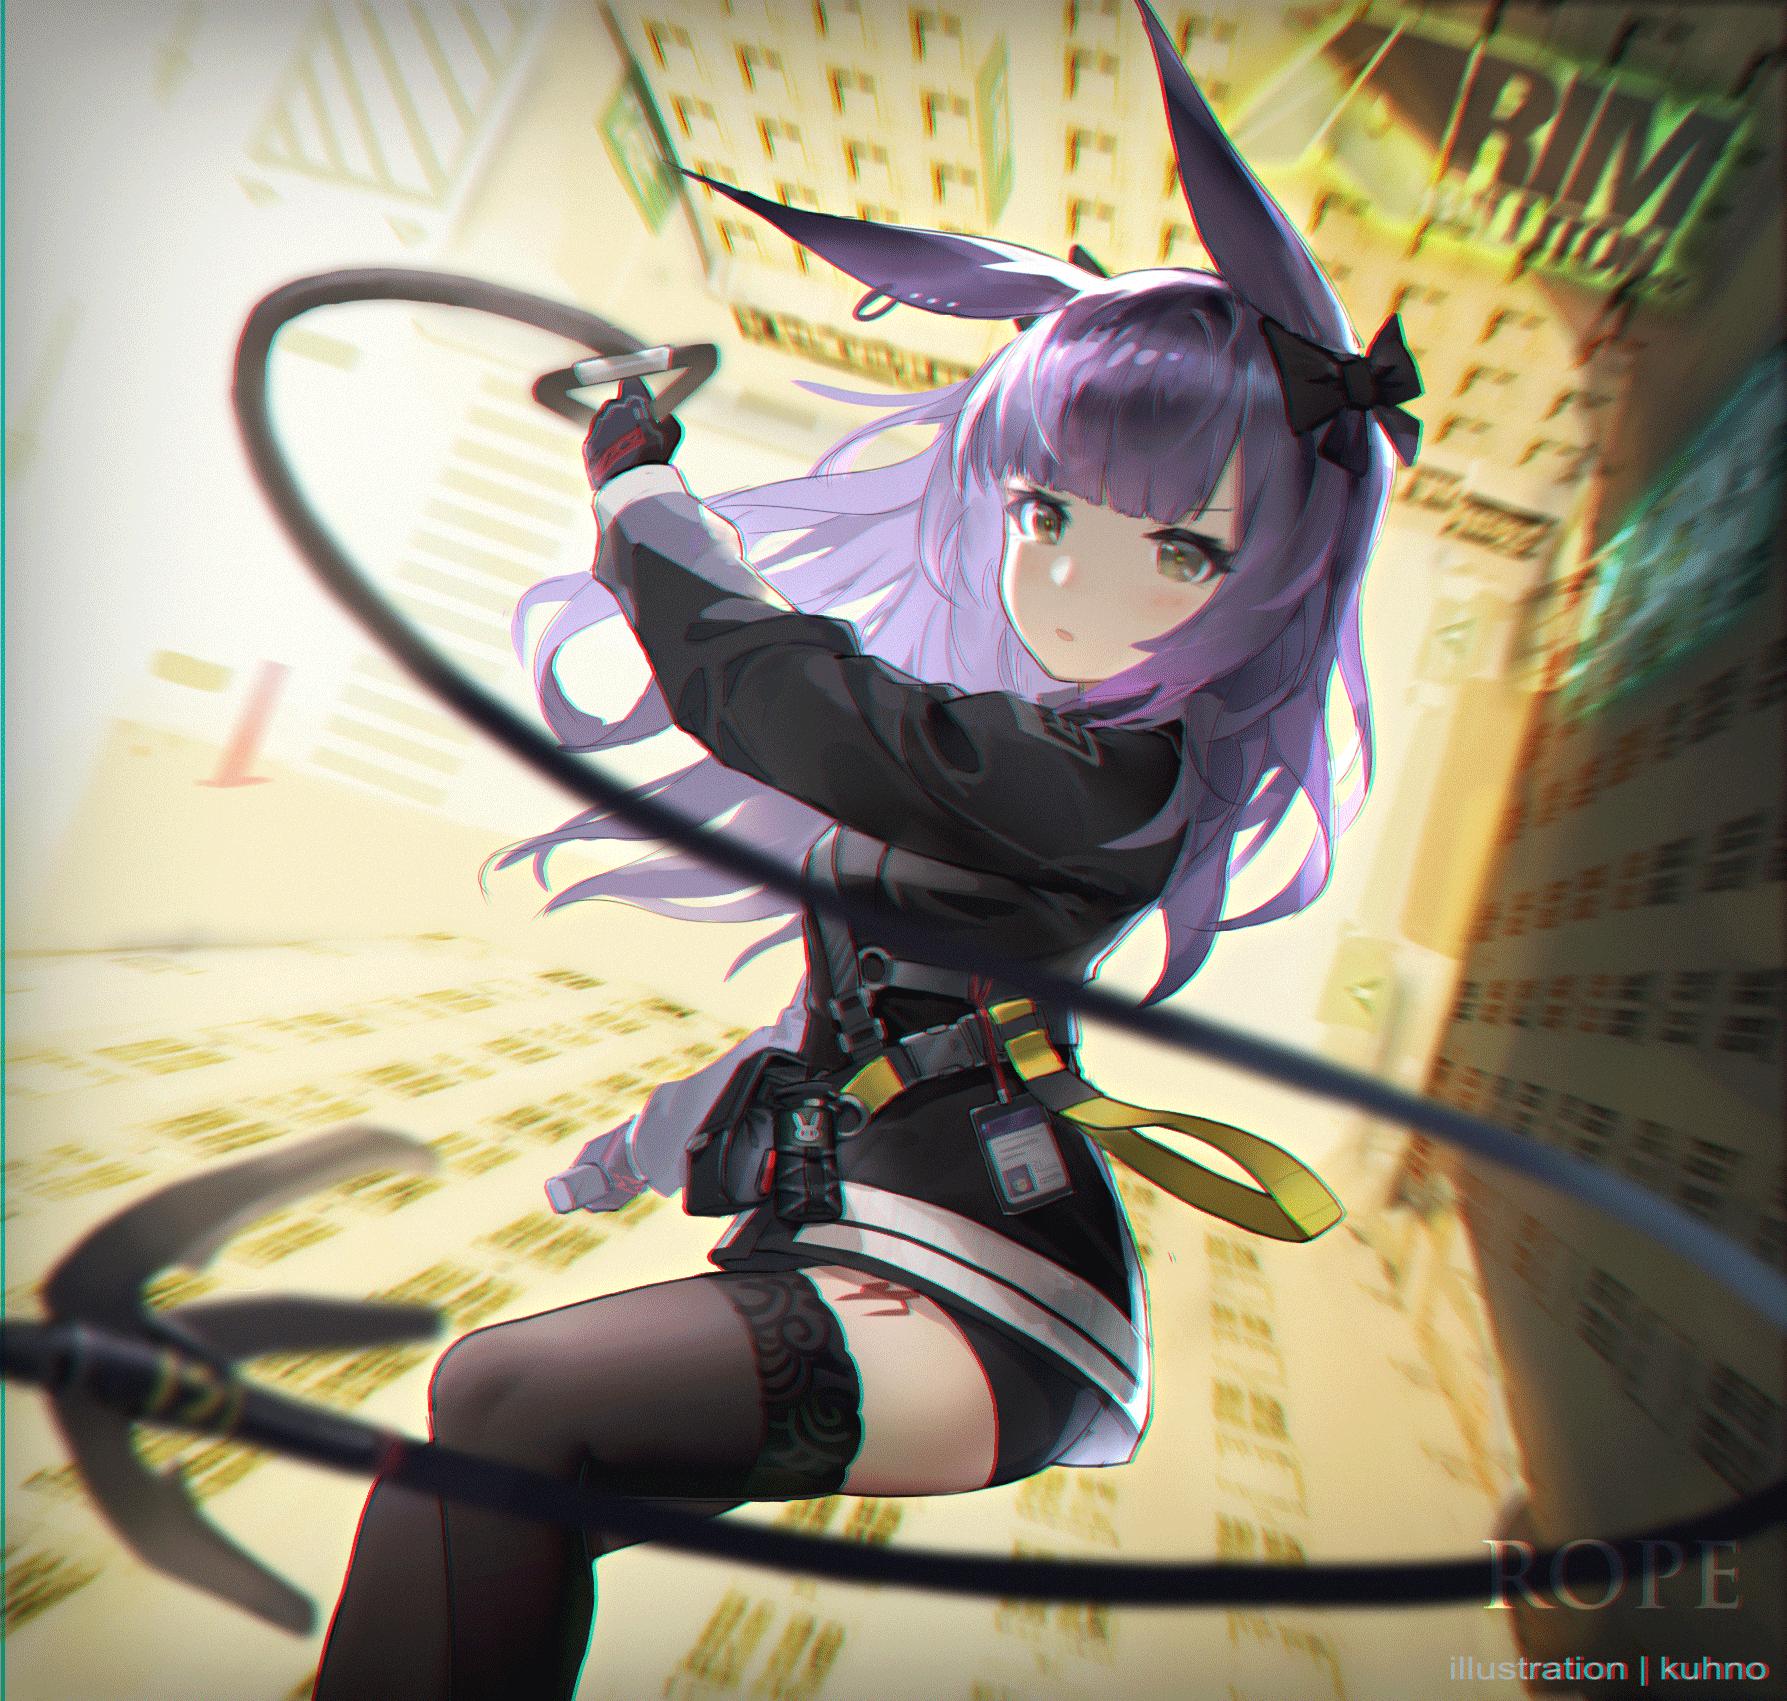 Anime 1787x1701 Kuhnowushi anime girls portrait display anime Arknights Rope (Arknights) animal ears purple hair black stockings